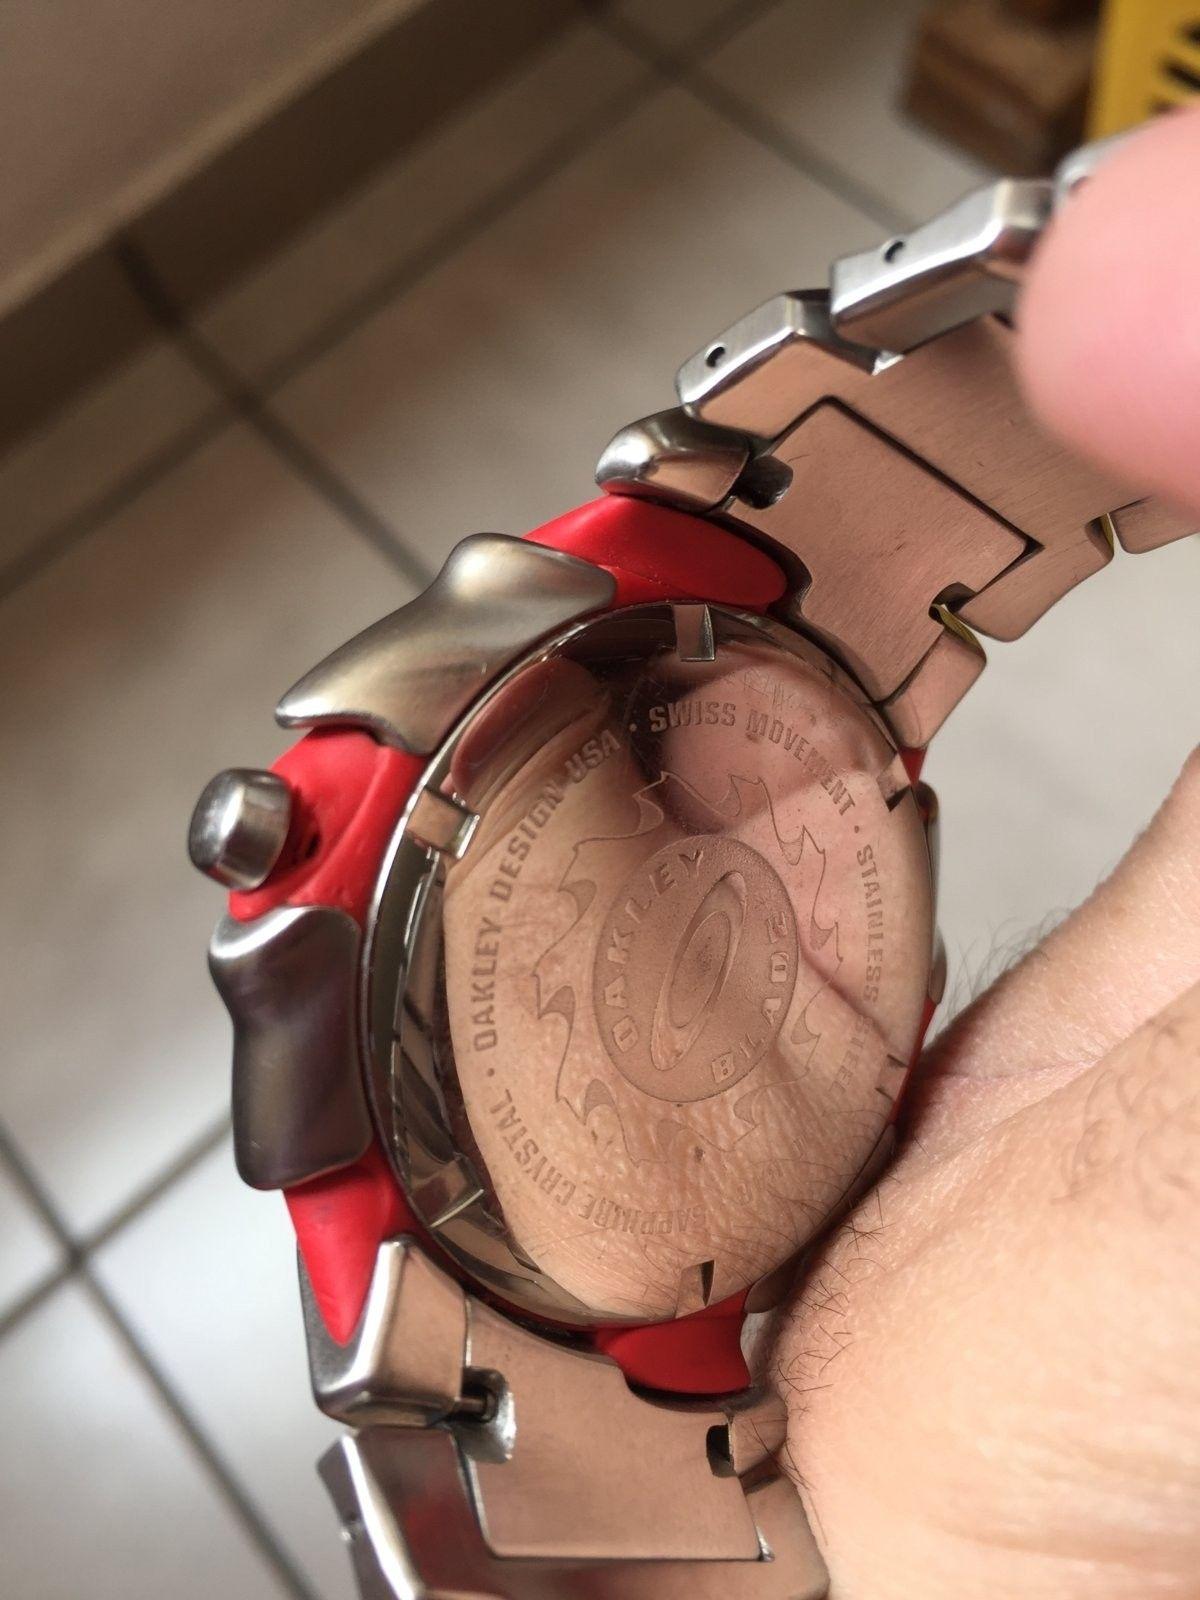 Blade Watch - IMG_2746.JPG